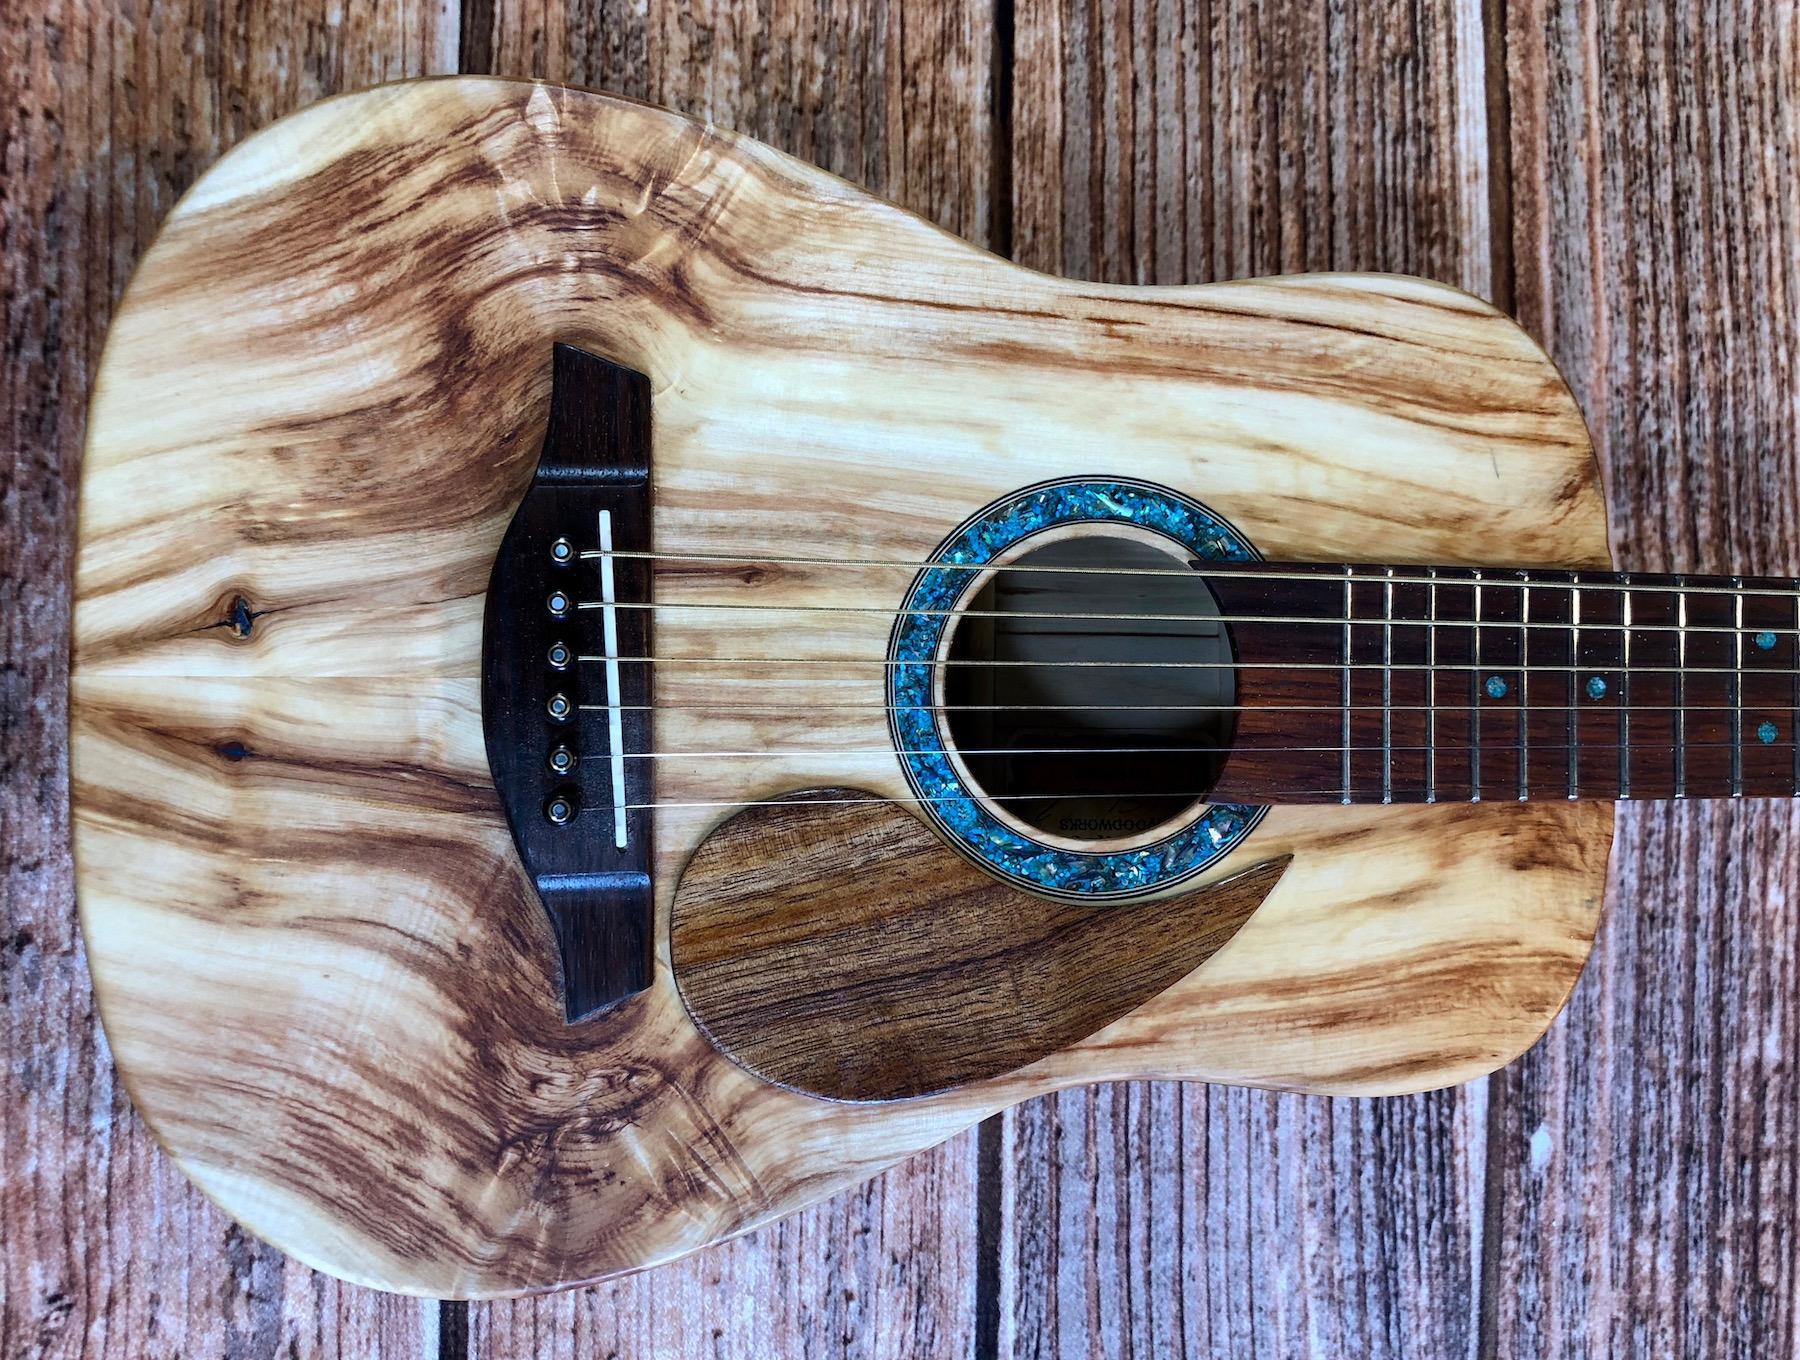 Guitar dread 2